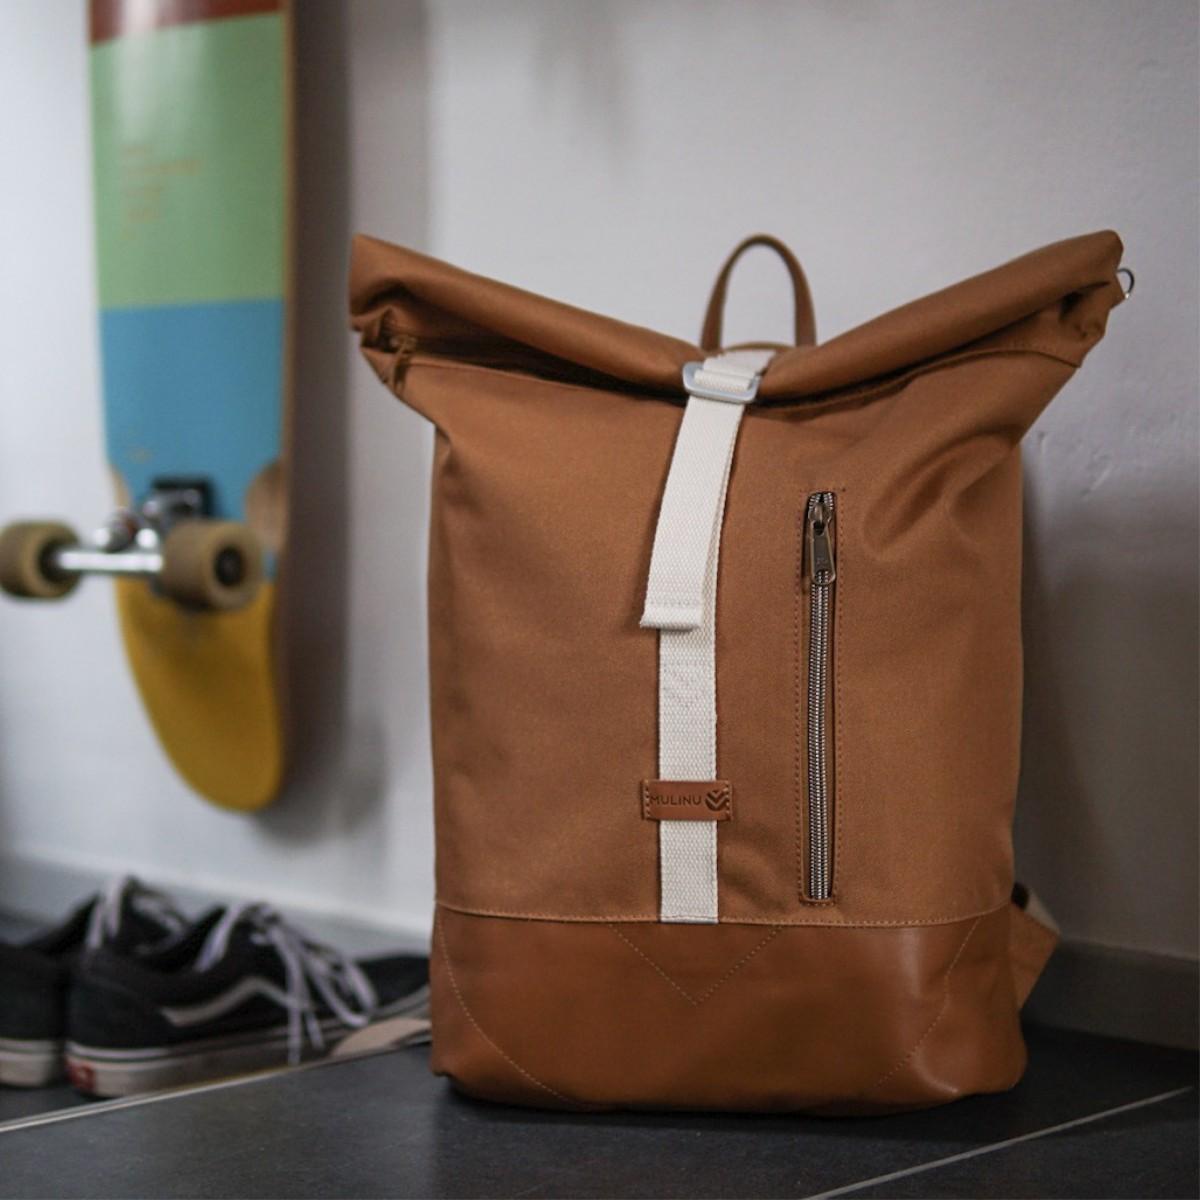 MULINU – Erweiterterbarer Rucksack UNIQUE ALBERT 2 Zimt Cognac Leder